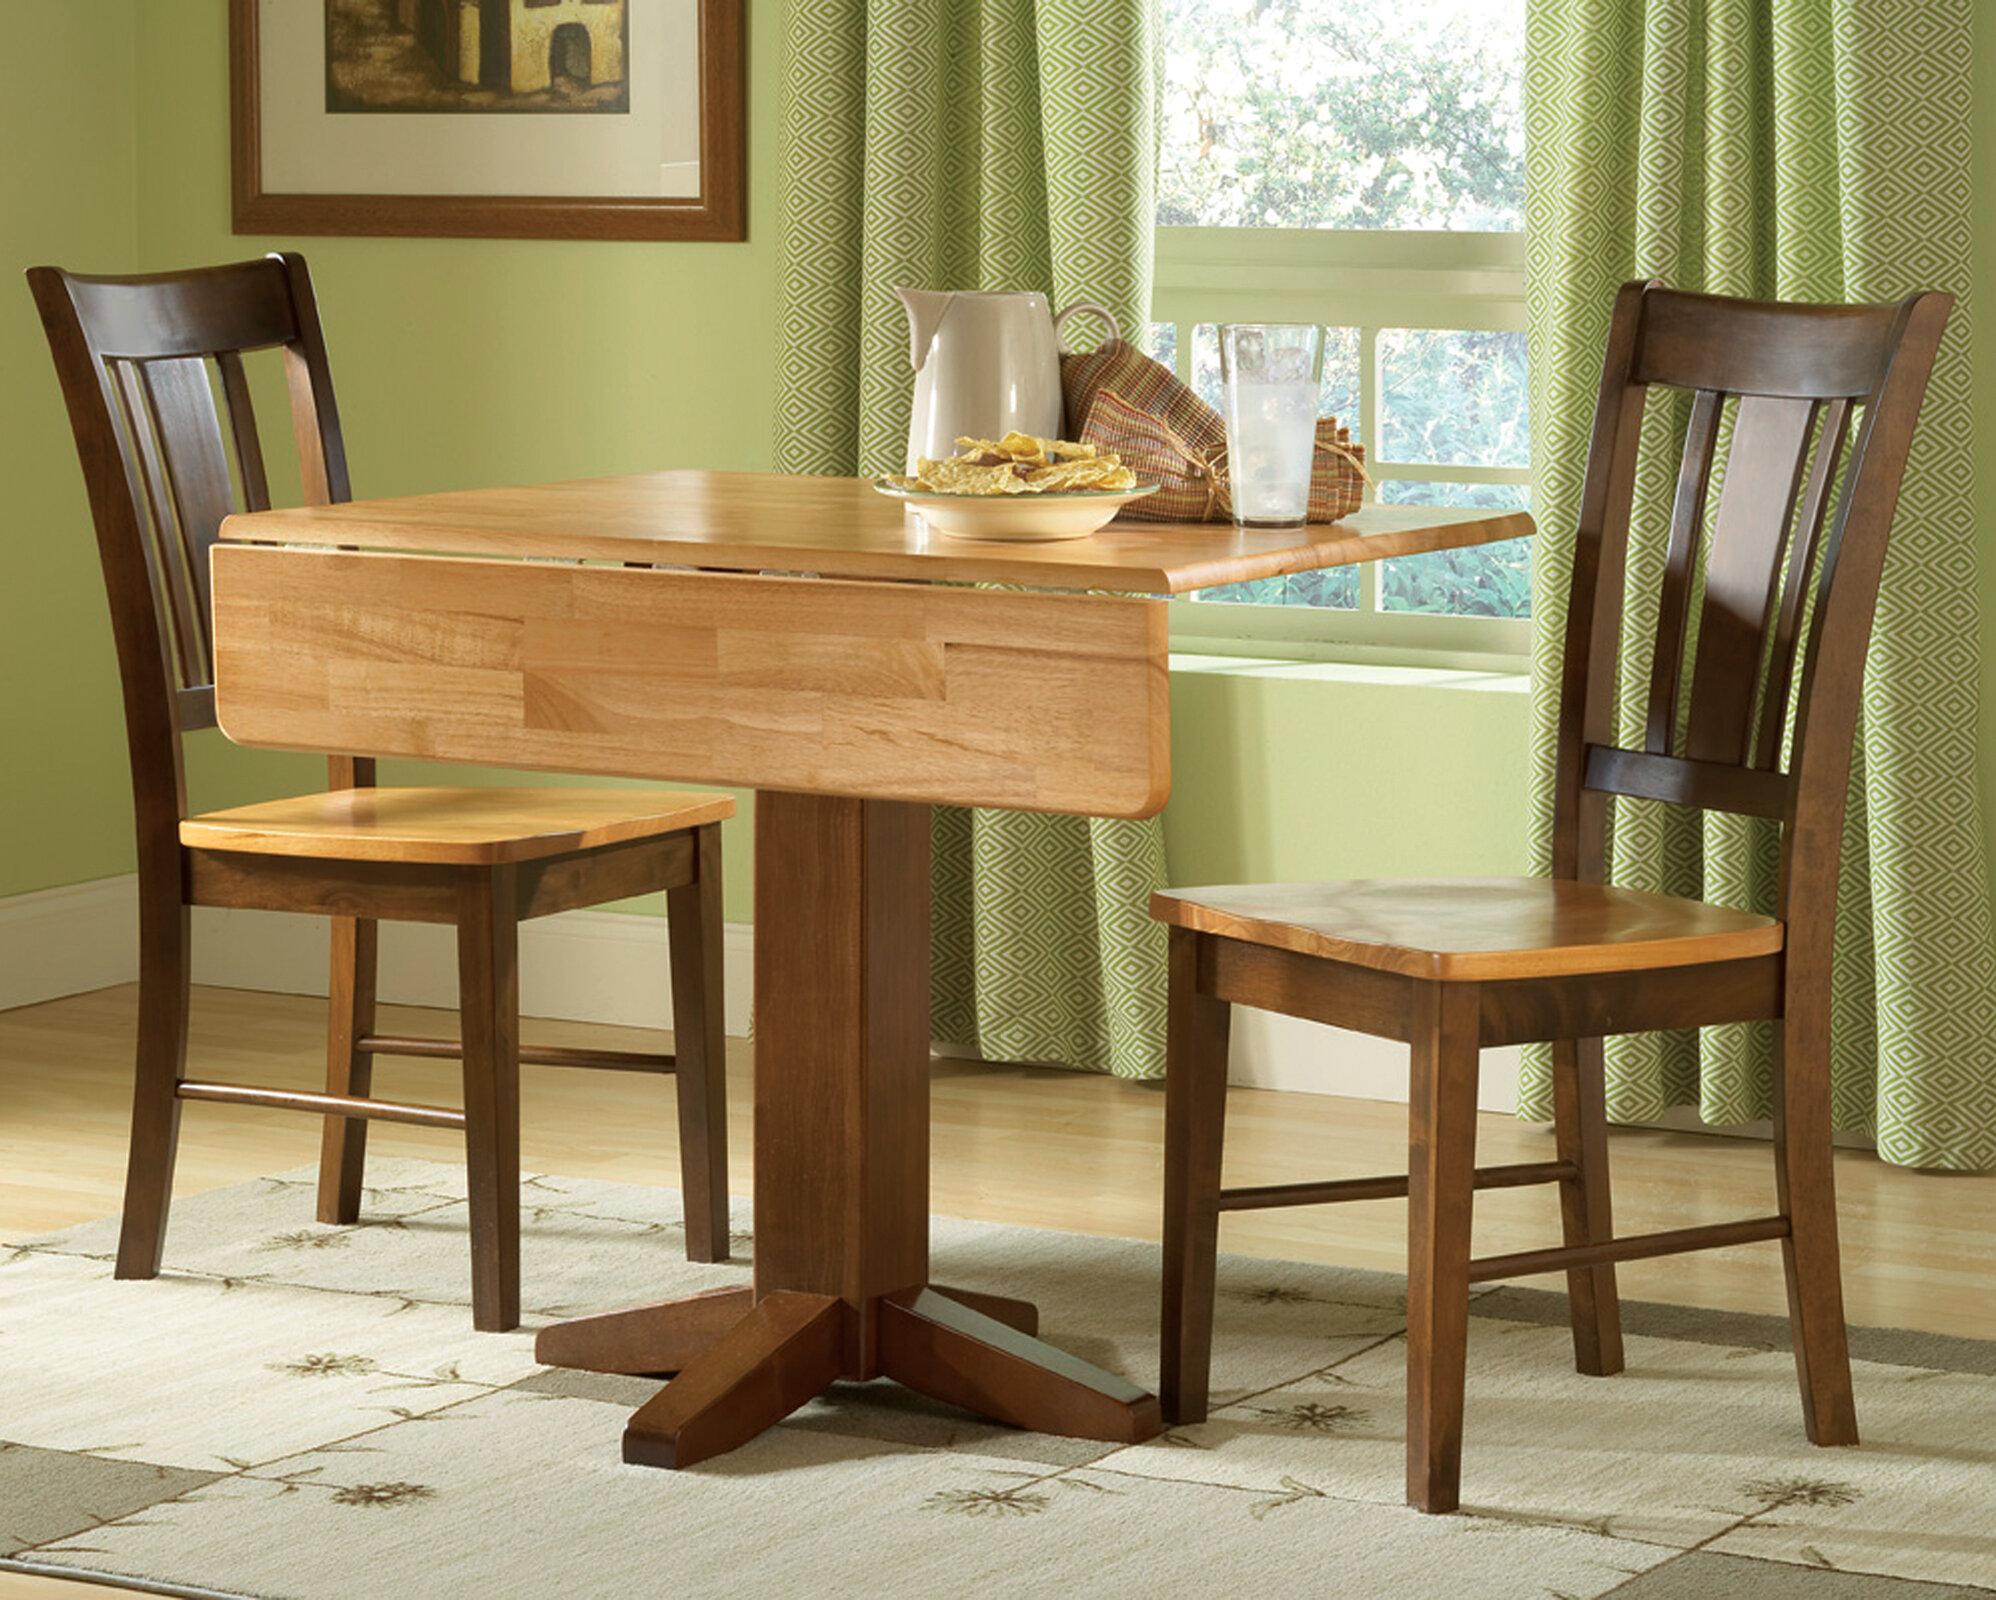 Pine Haven 3 Piece Drop Leaf Solid Wood Dining Set